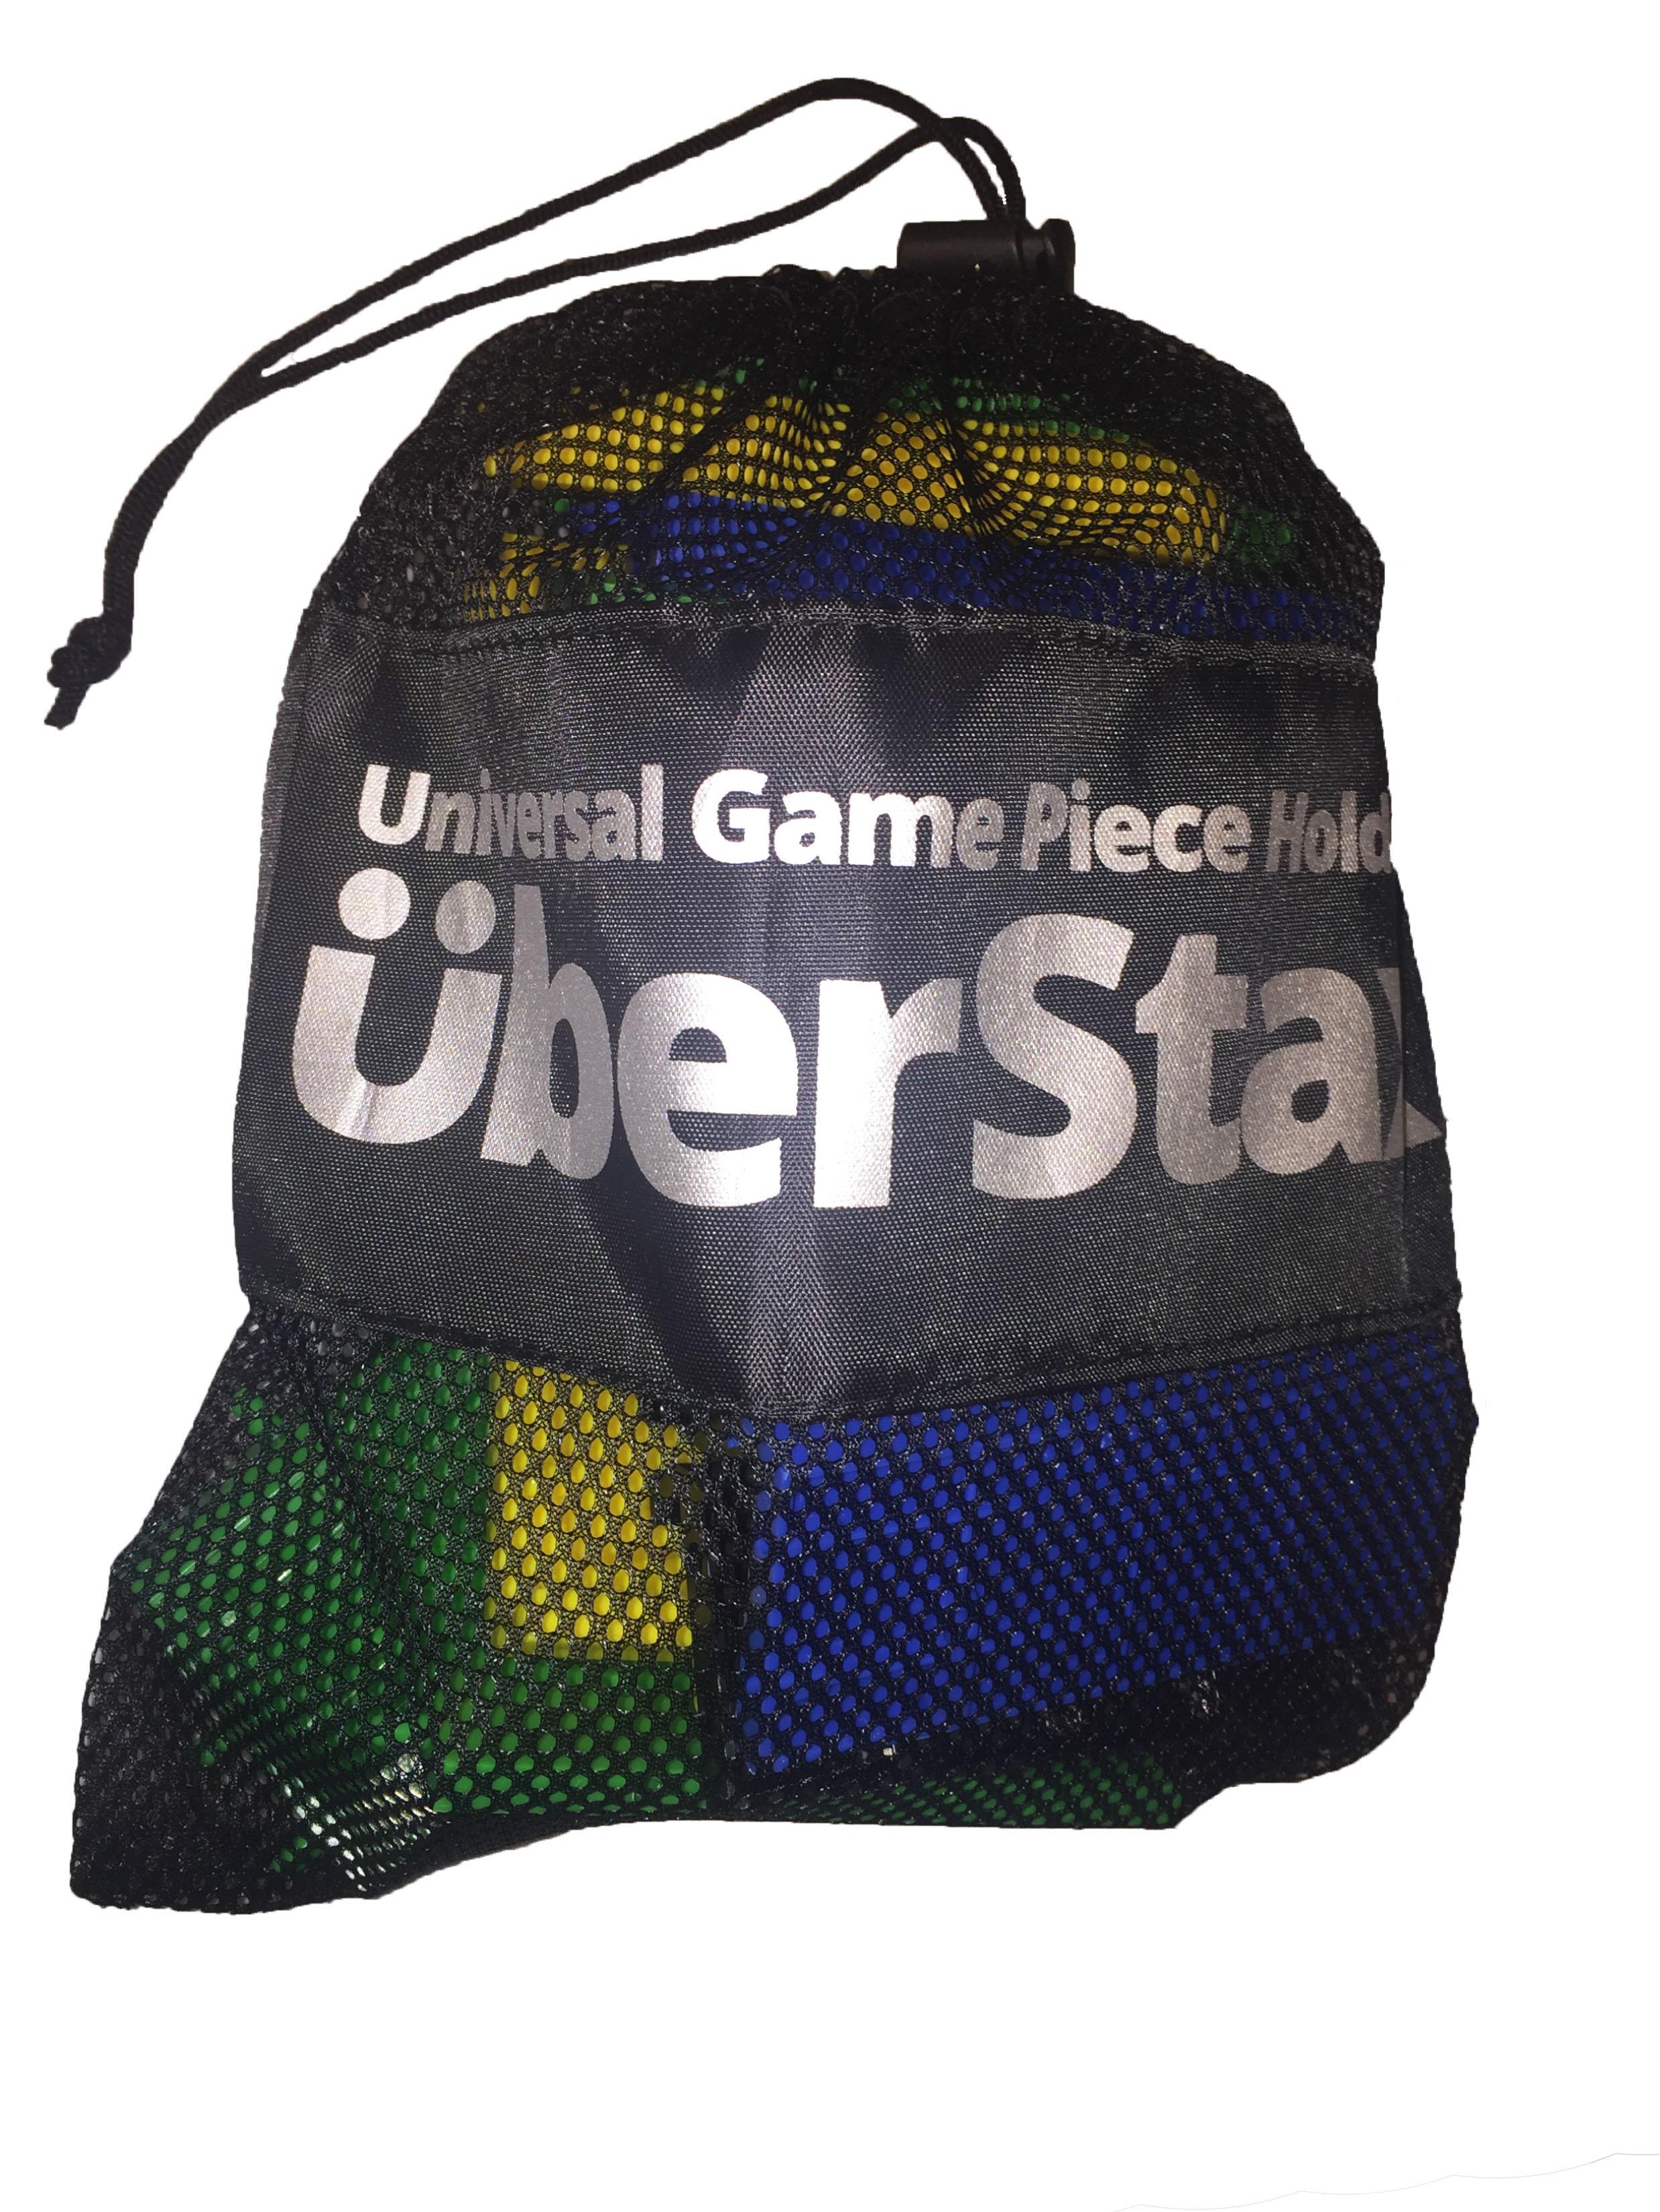 UberStax Limited Edition Storage Bag